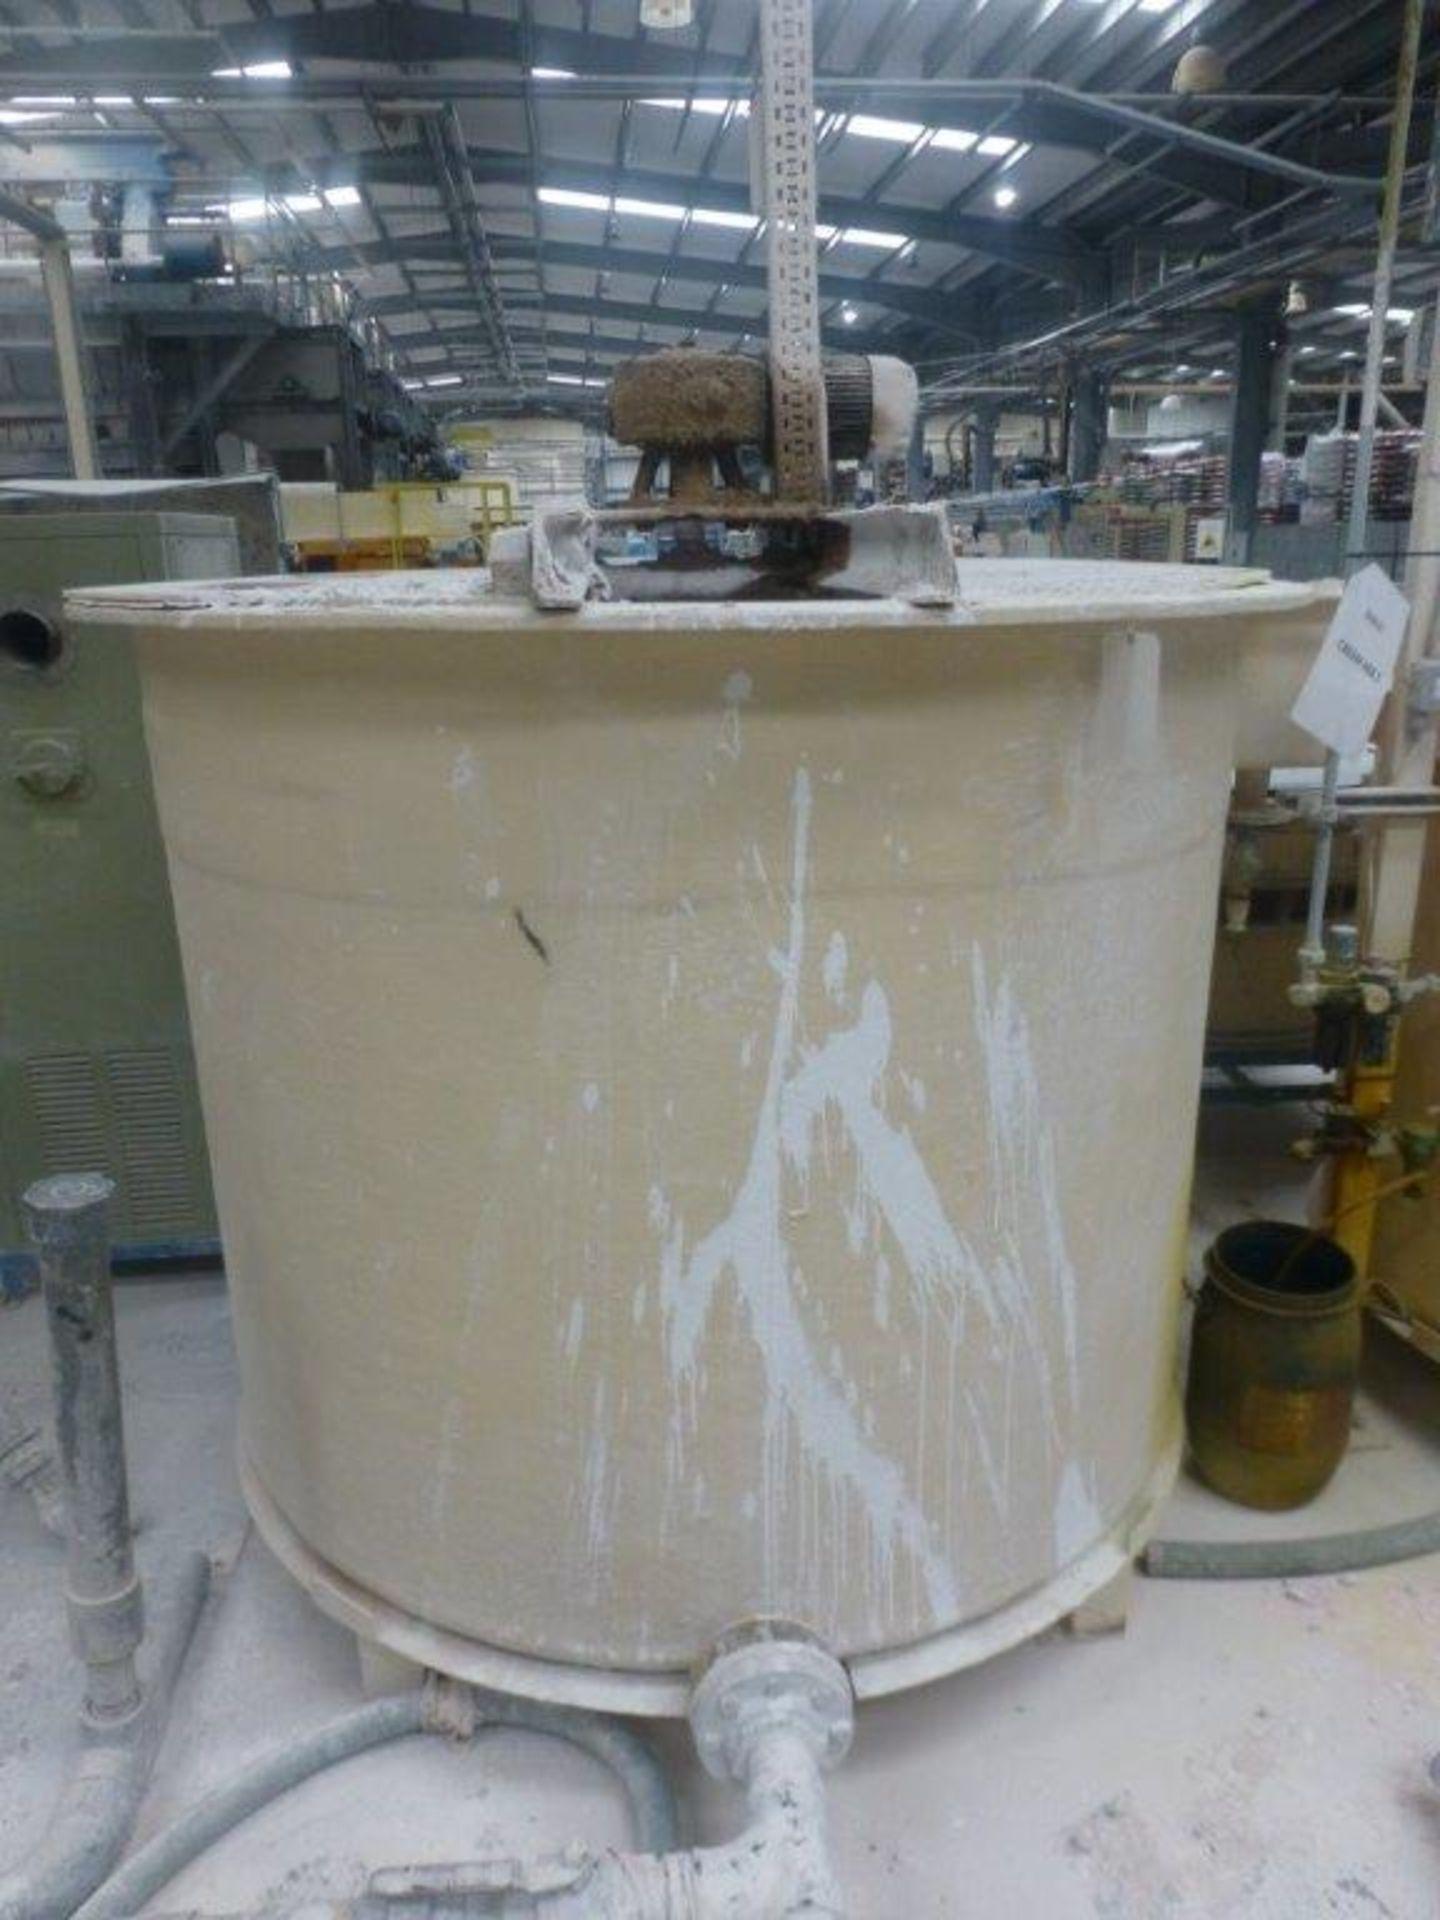 Lot 36 - 1700 x 1500 GRP mixing tank with motorised agitator, Plant No SHA17 Cream Ark 1